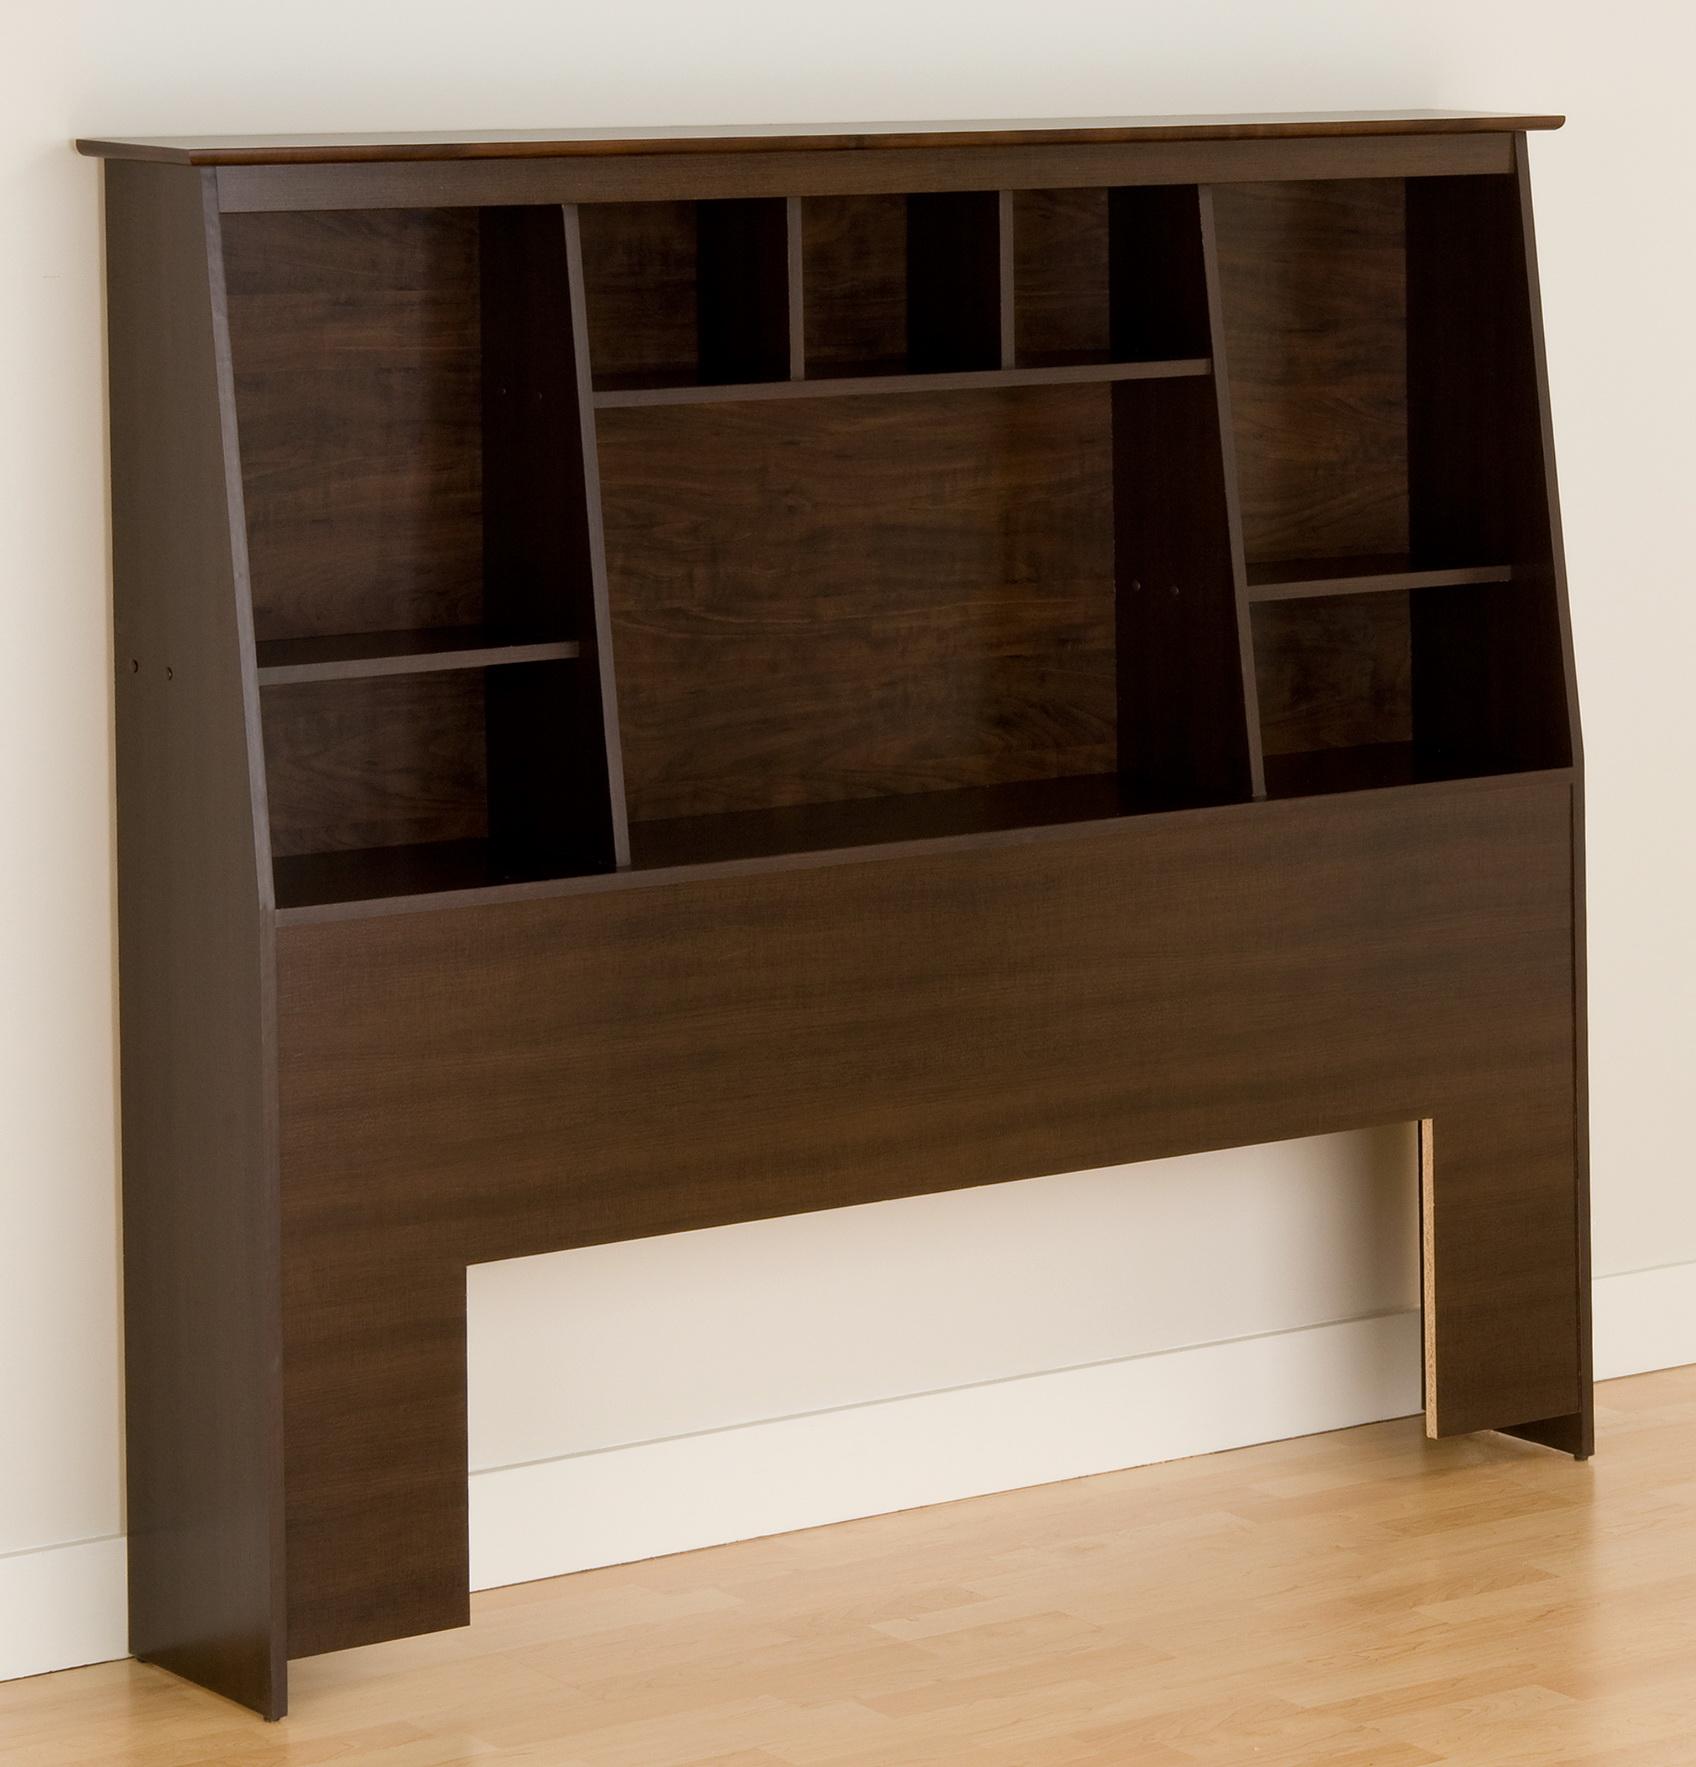 Queen Bookcase Headboard Ikea